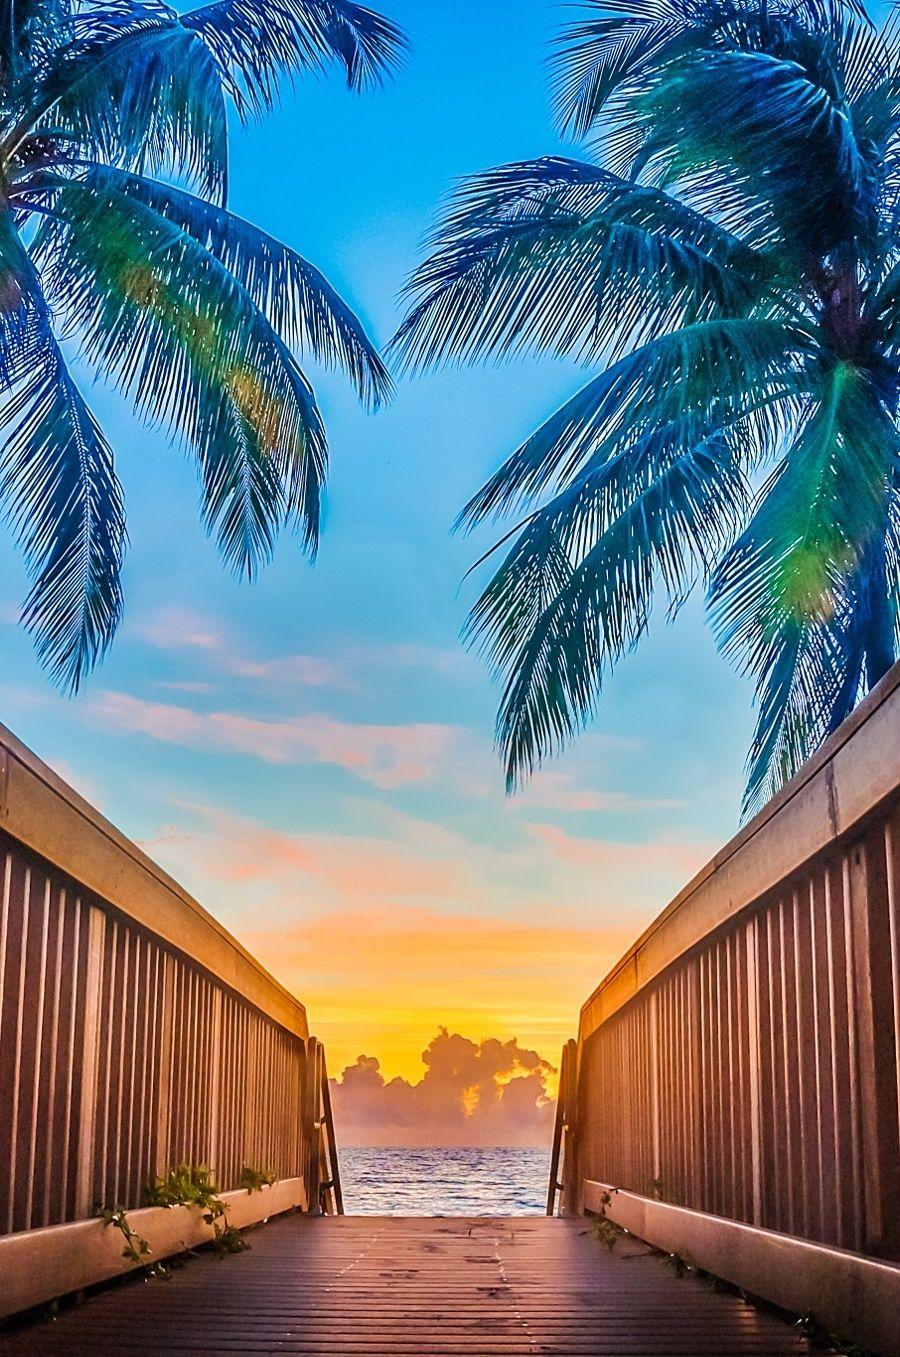 Beach Sunrise   La Beℓℓe ℳystère <3 www.BillionDollarBaby.biz ~ http://www.Pinterest.com/keymail22